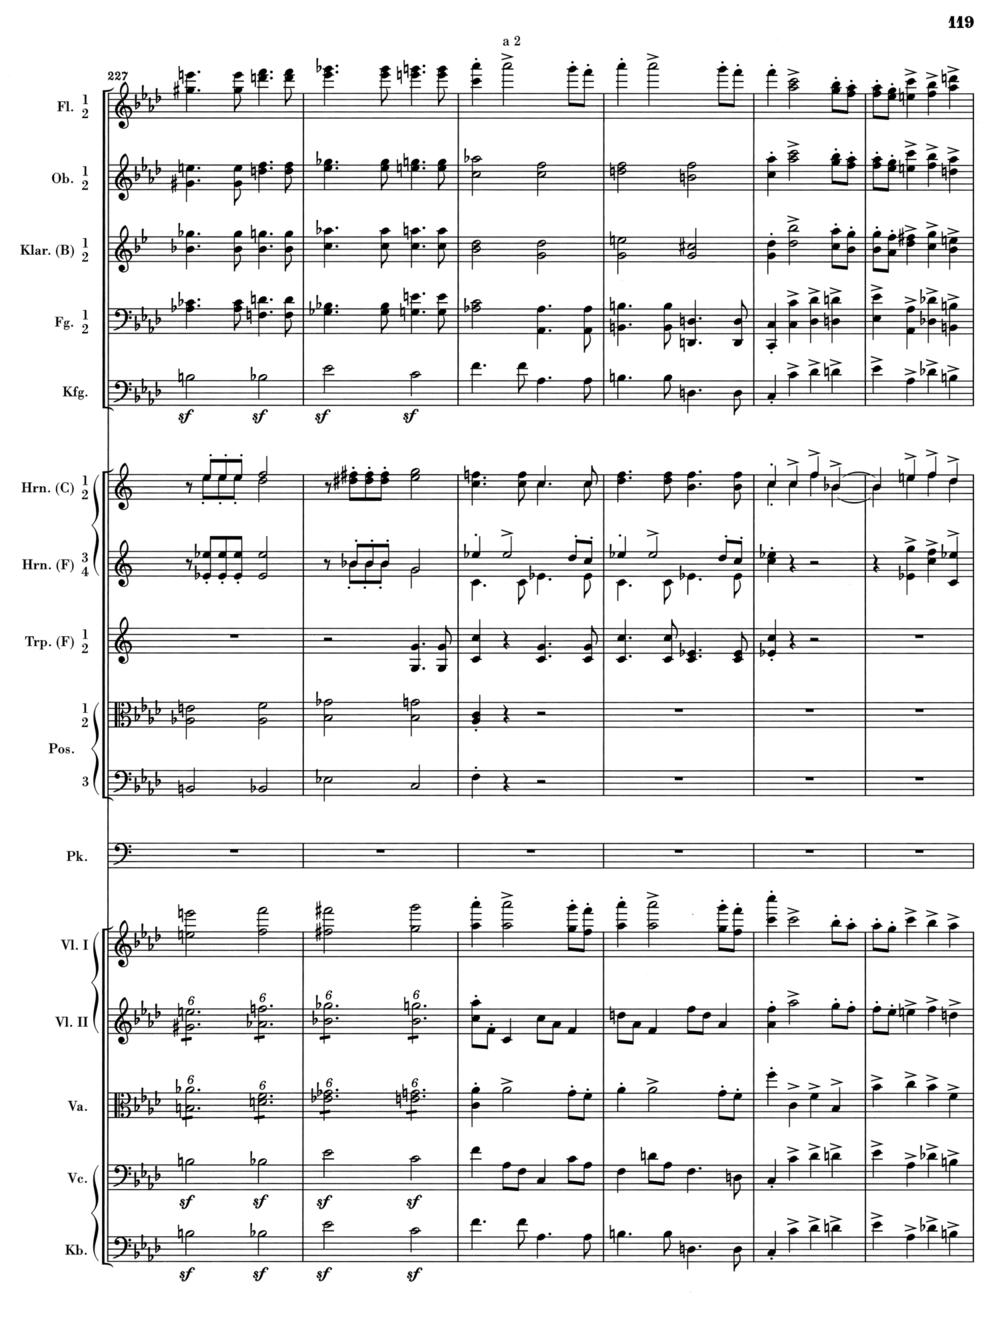 Brahms 3 Score 12.jpg